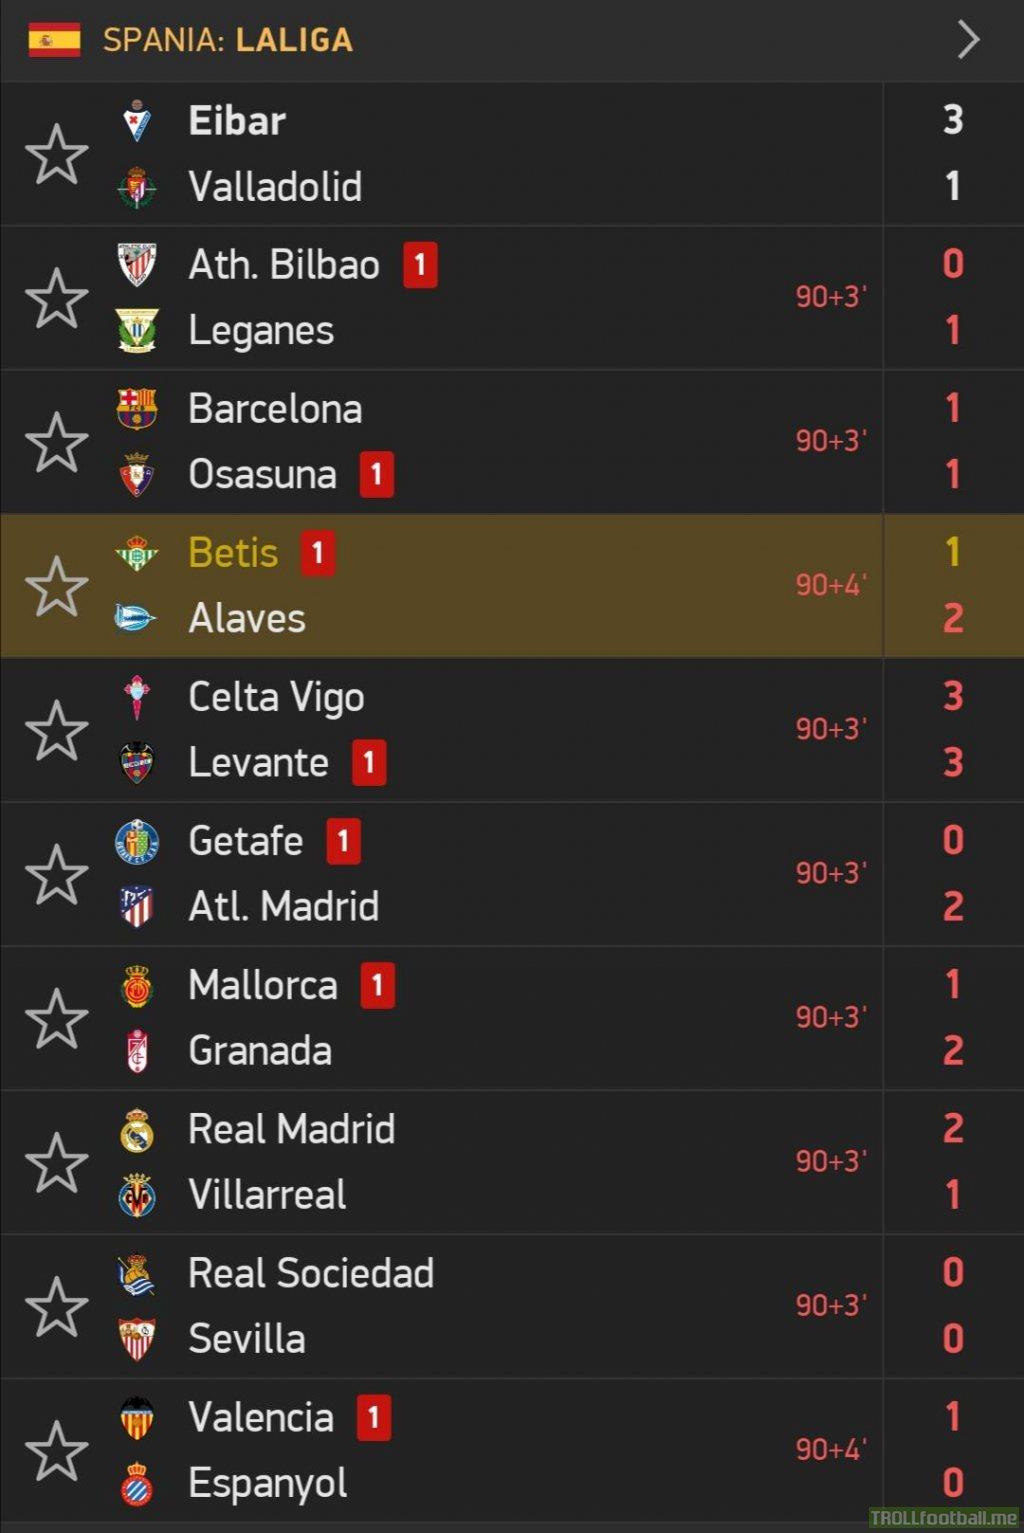 7 reds in La Liga tonight